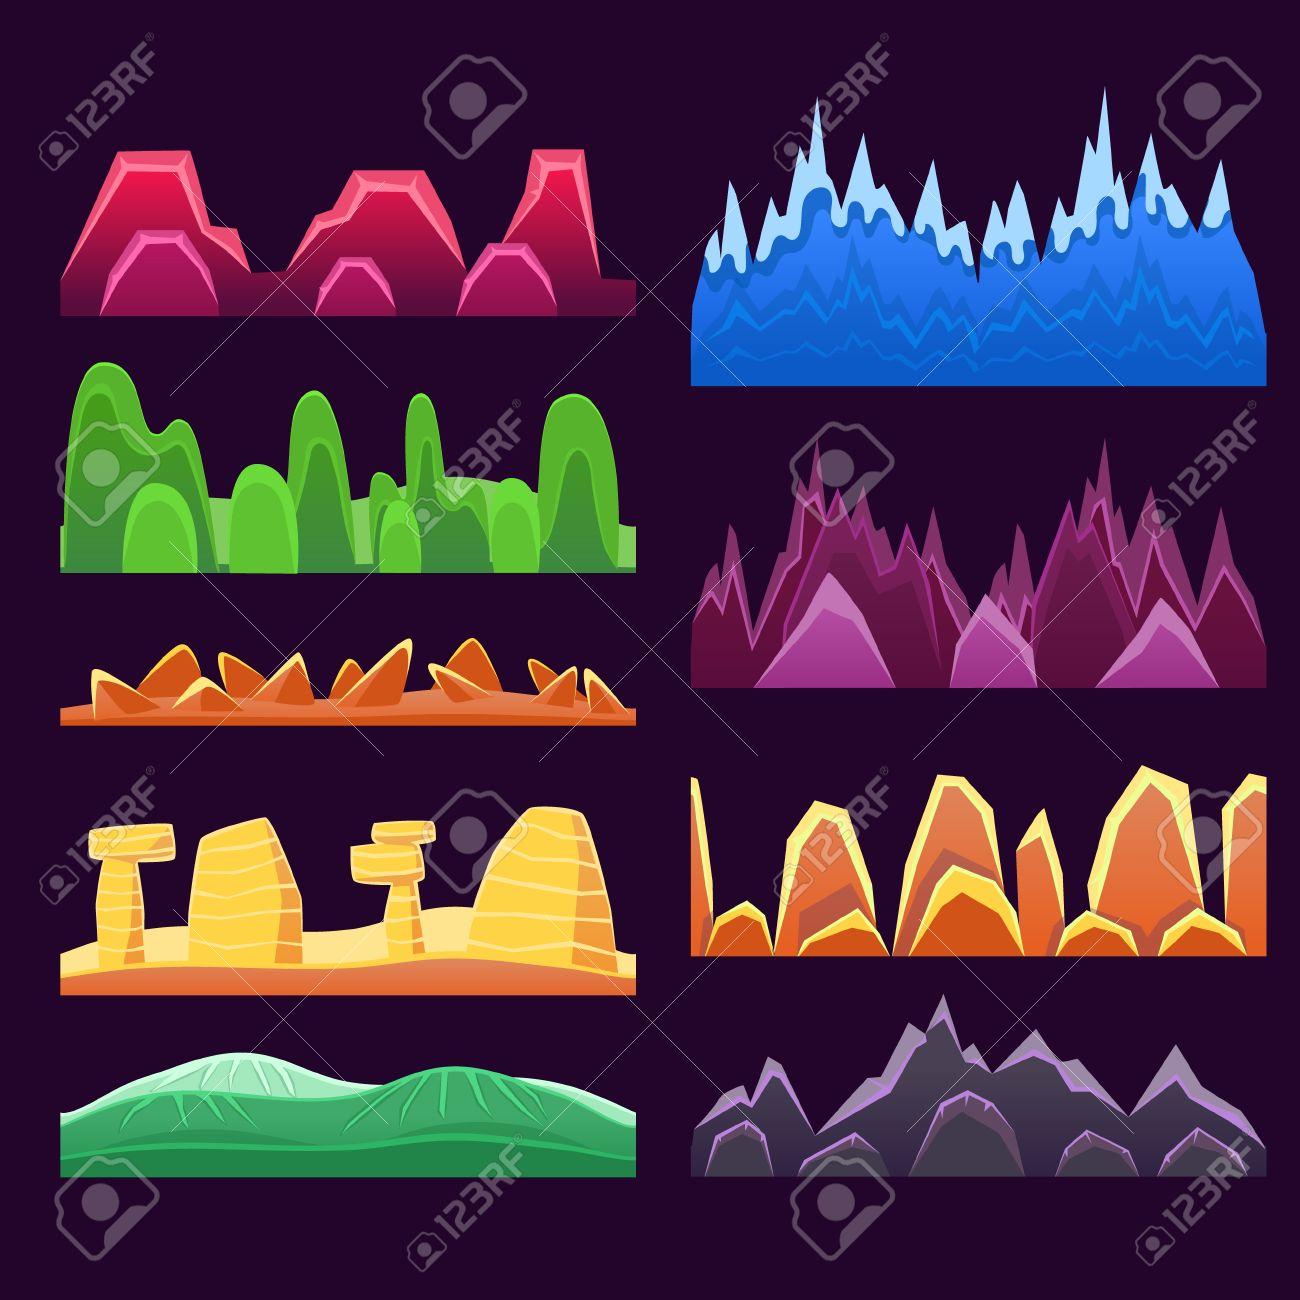 Montañas Exóticas Y Paisajismo Desierto Inconsútiles Modelos Fondo ...